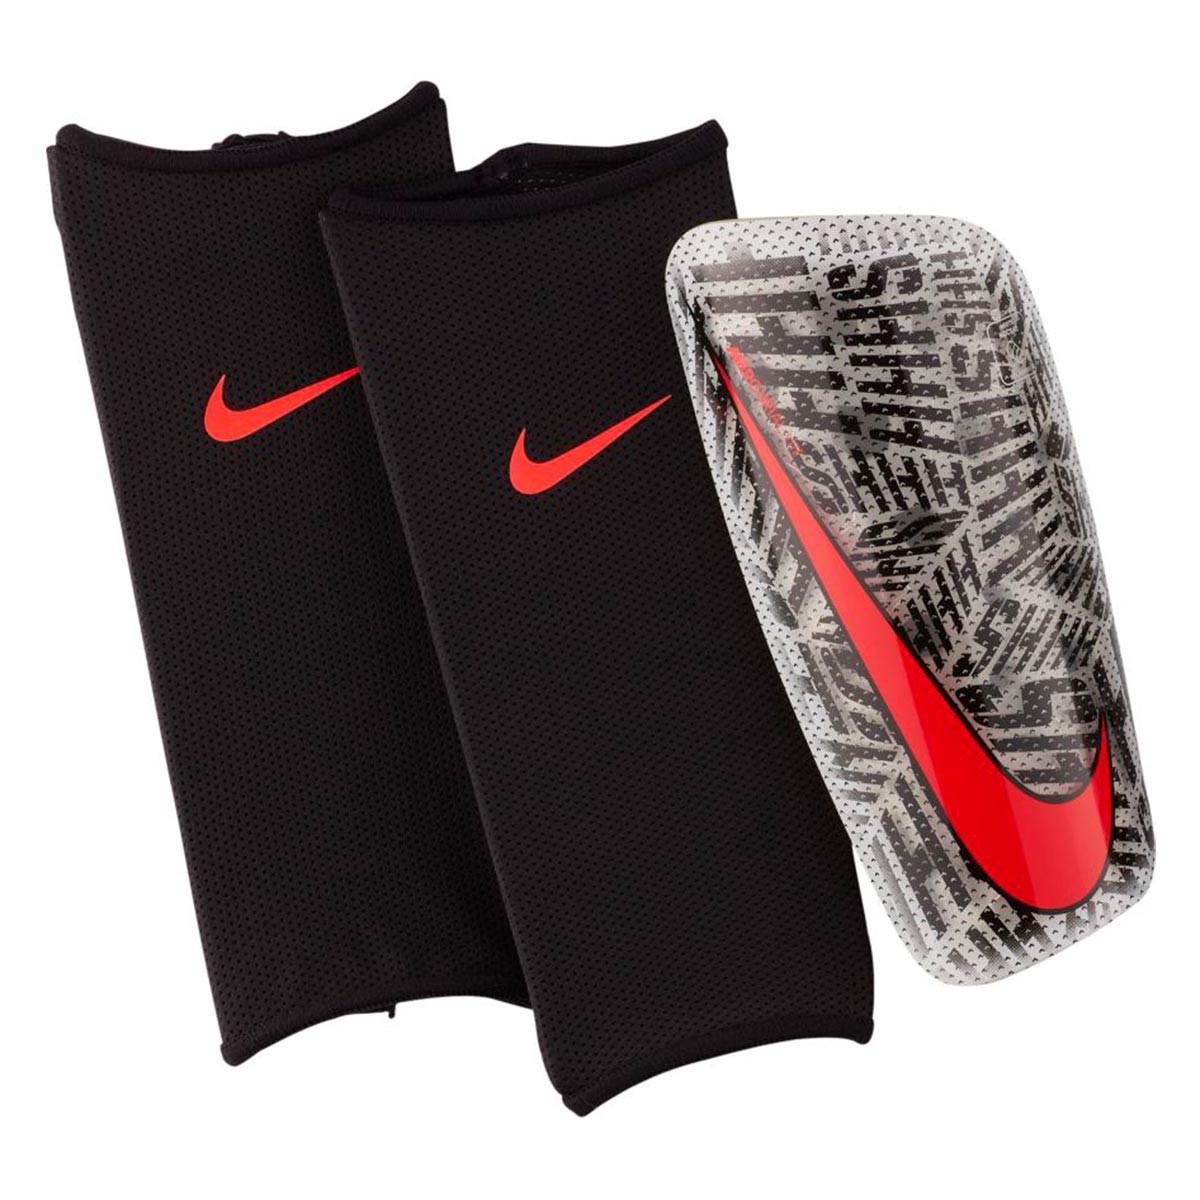 Shinpads Nike Mercurial Lite Neymar Jr White-Black-Challenge red -  Soloporteros es ahora Fútbol Emotion fc46230d5771a